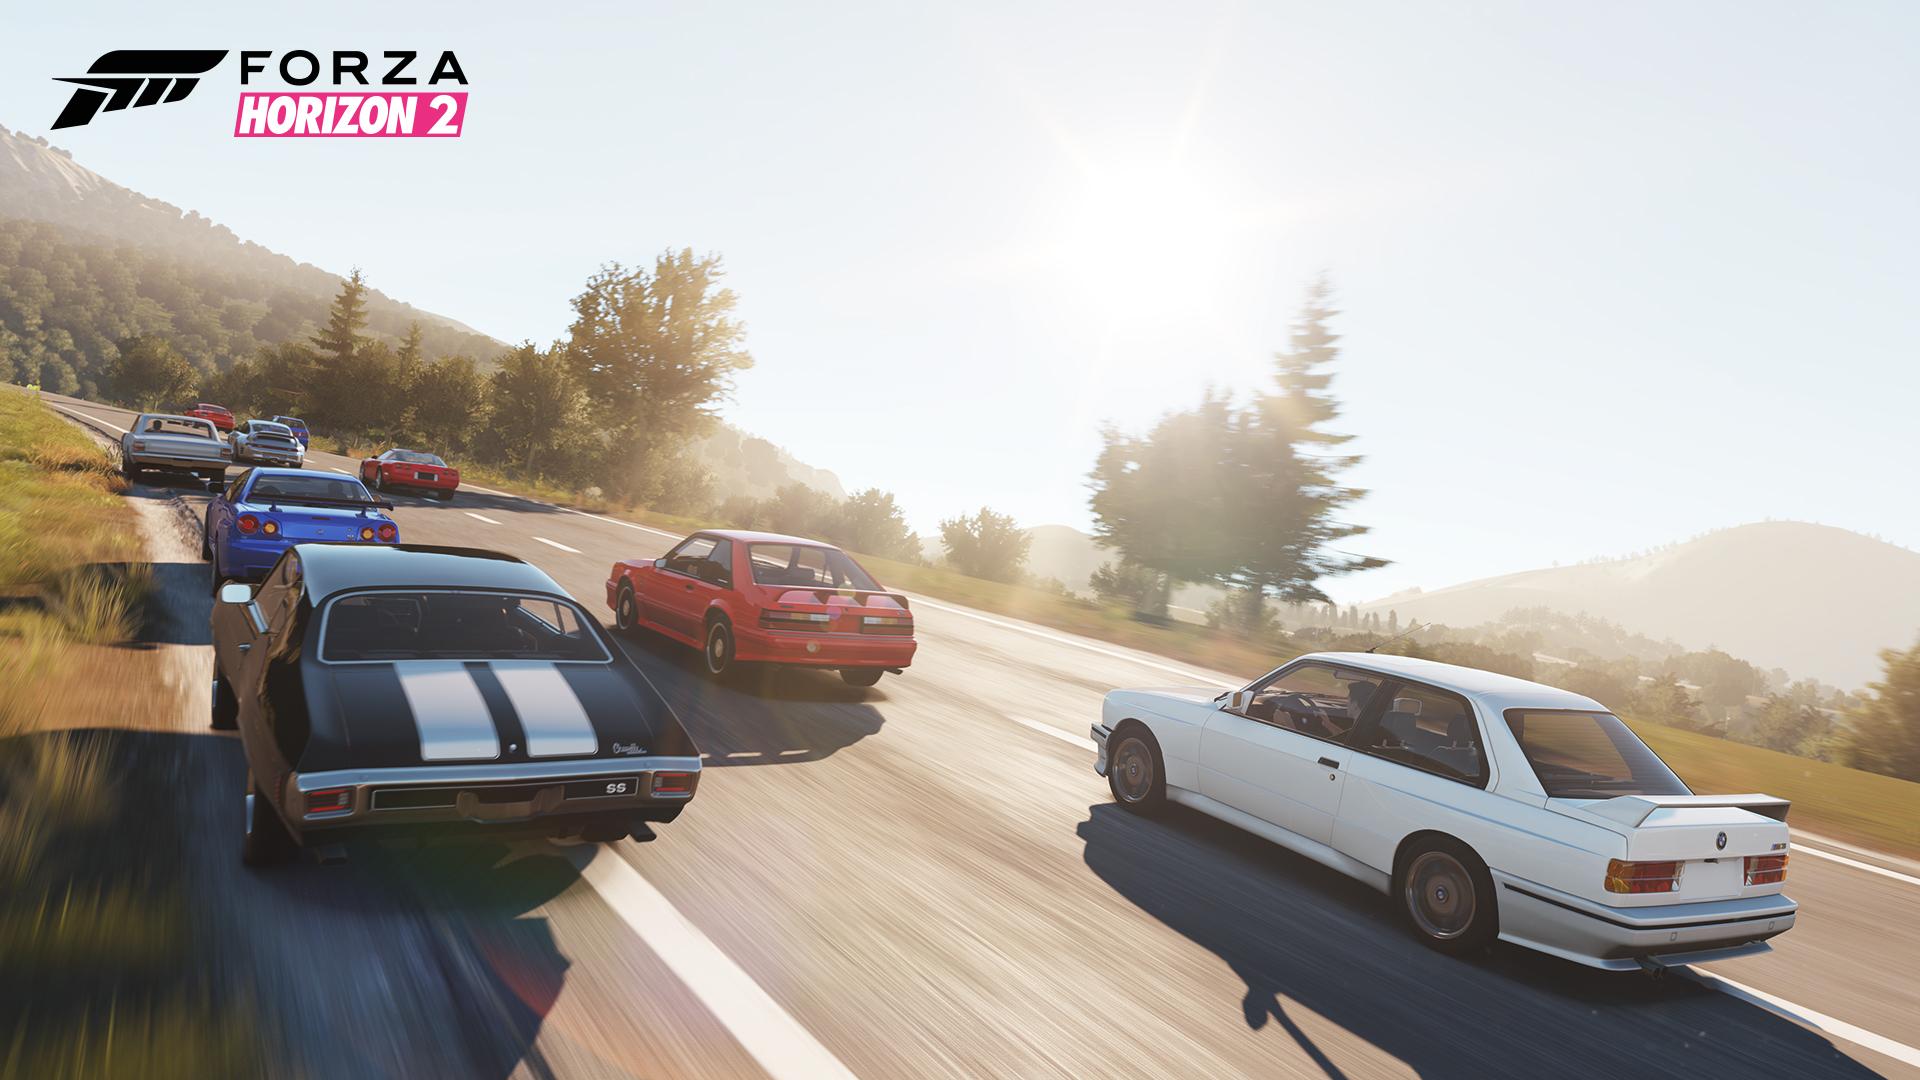 TheXboxHub's official Forza Horizon 2 Car Club is now open!   TheXboxHub